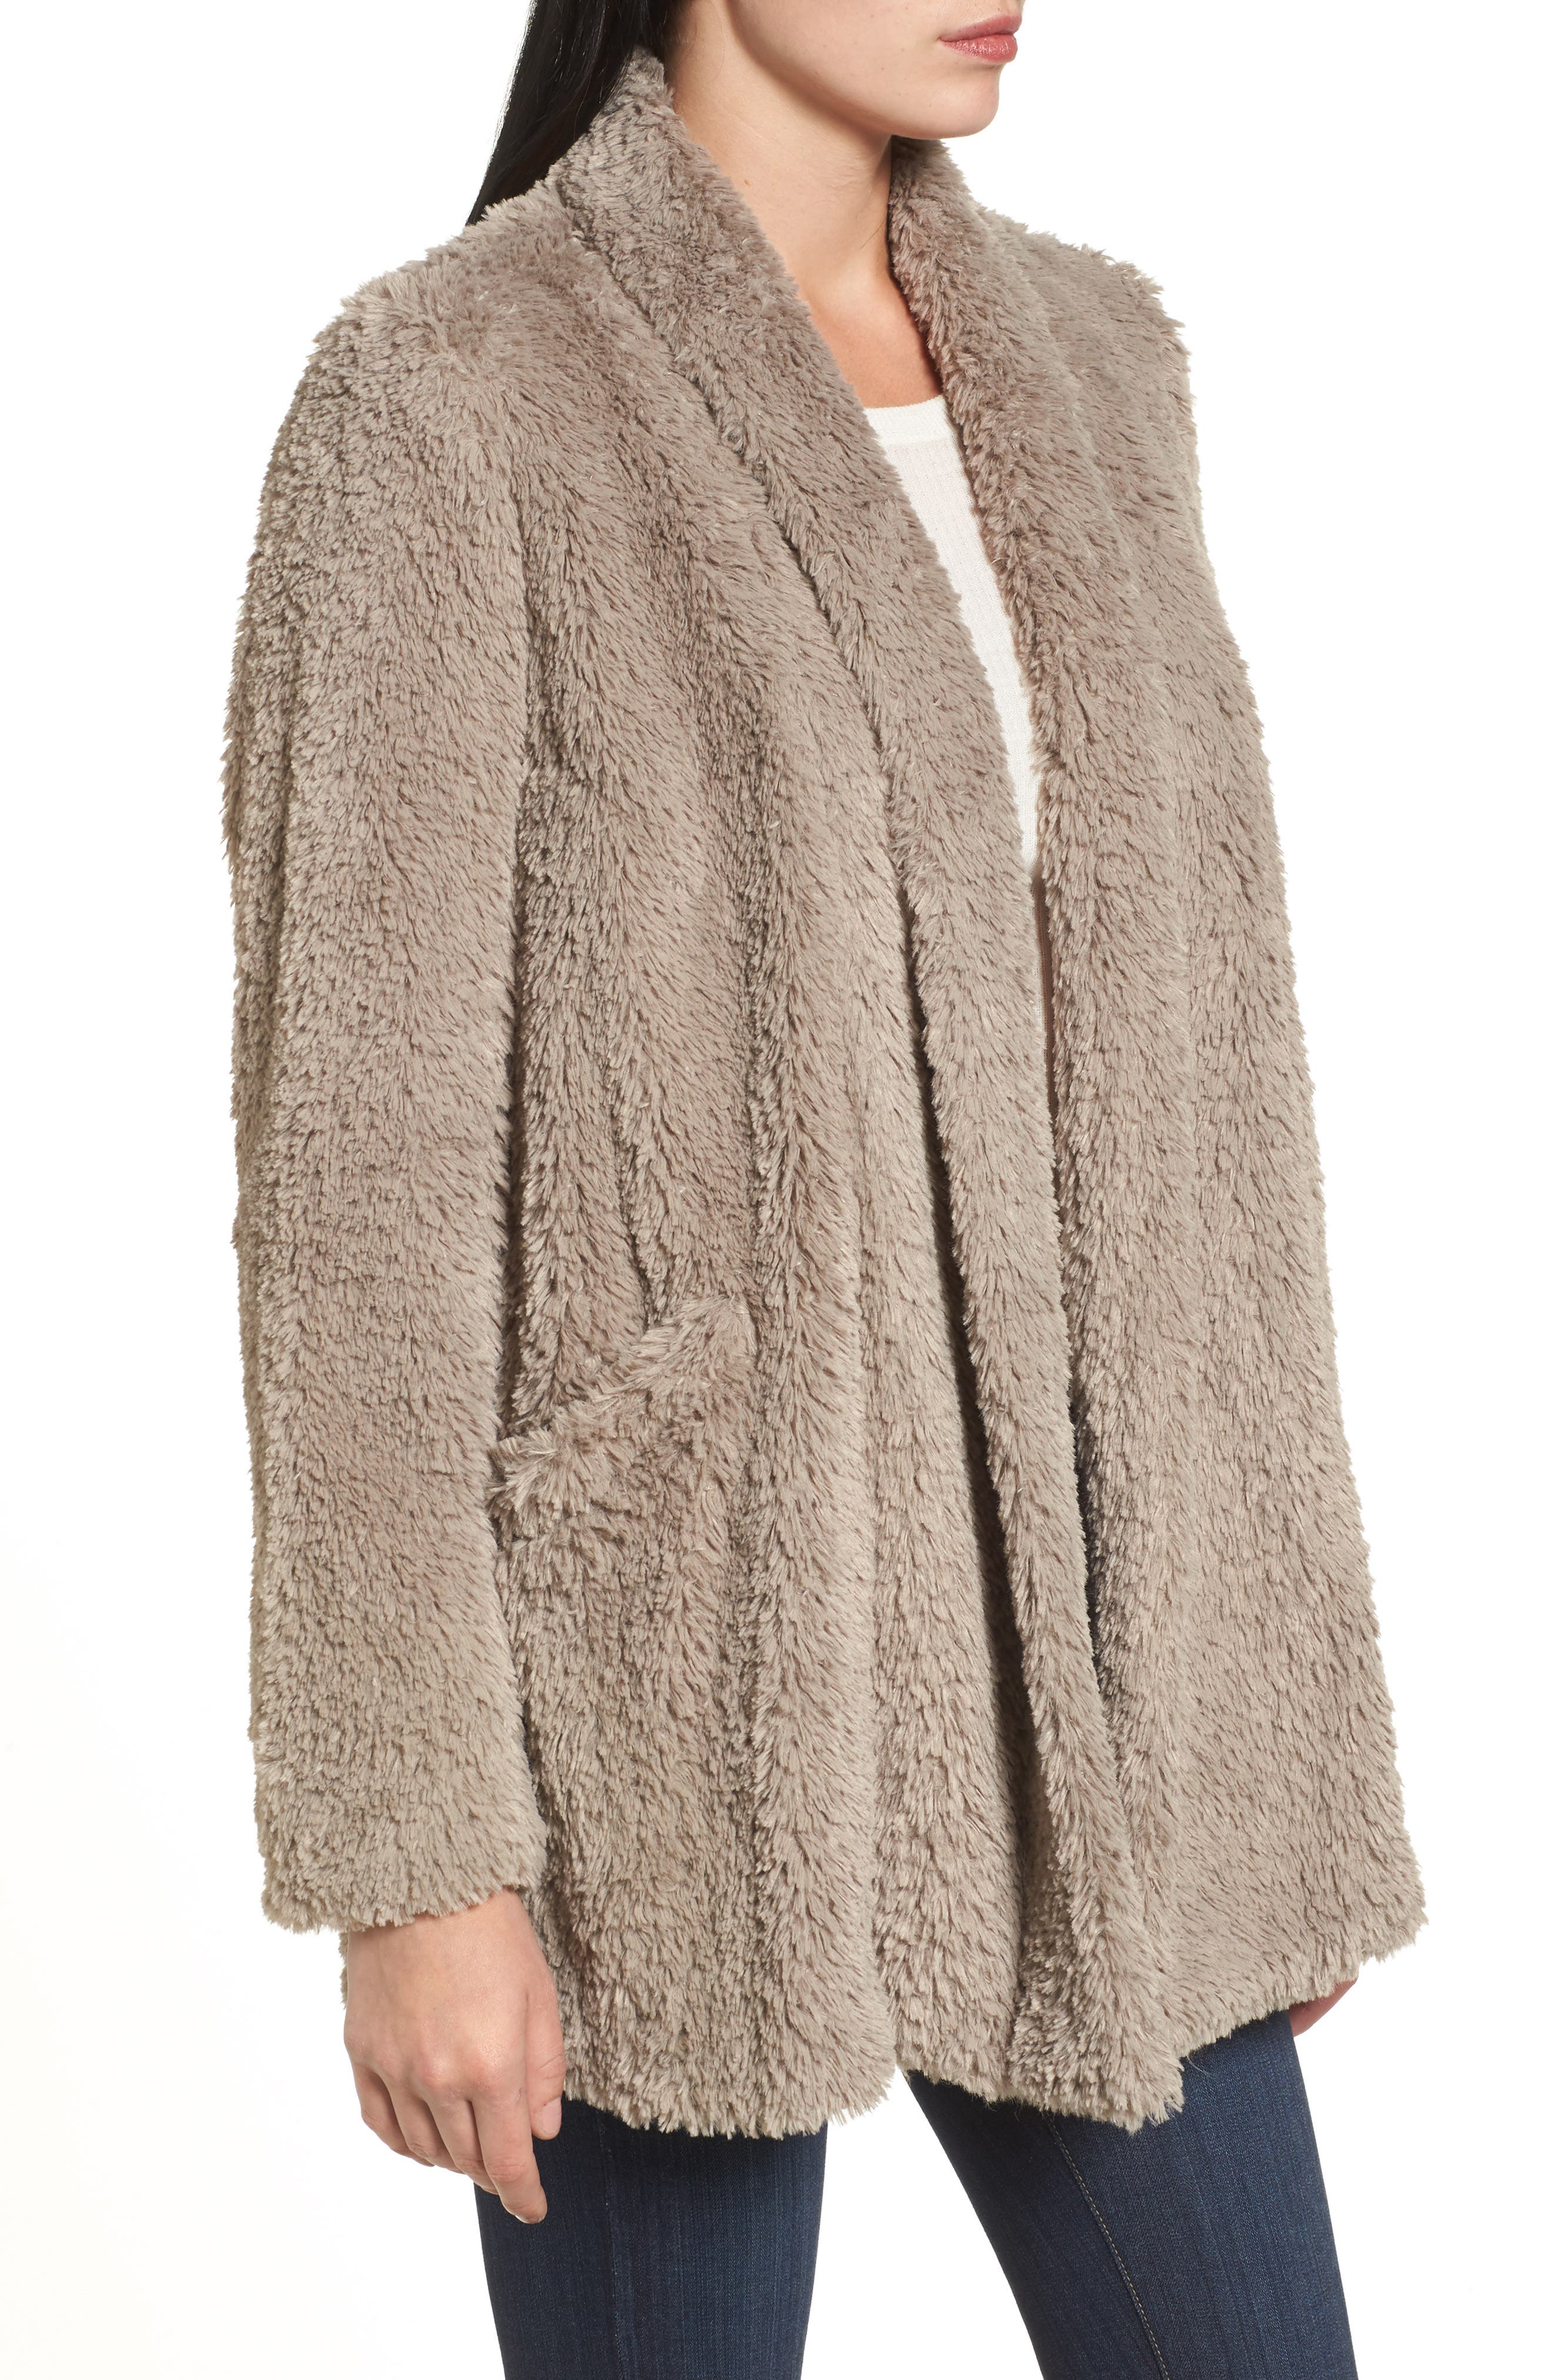 'Teddy Bear' Faux Fur Clutch Coat,                             Alternate thumbnail 3, color,                             254